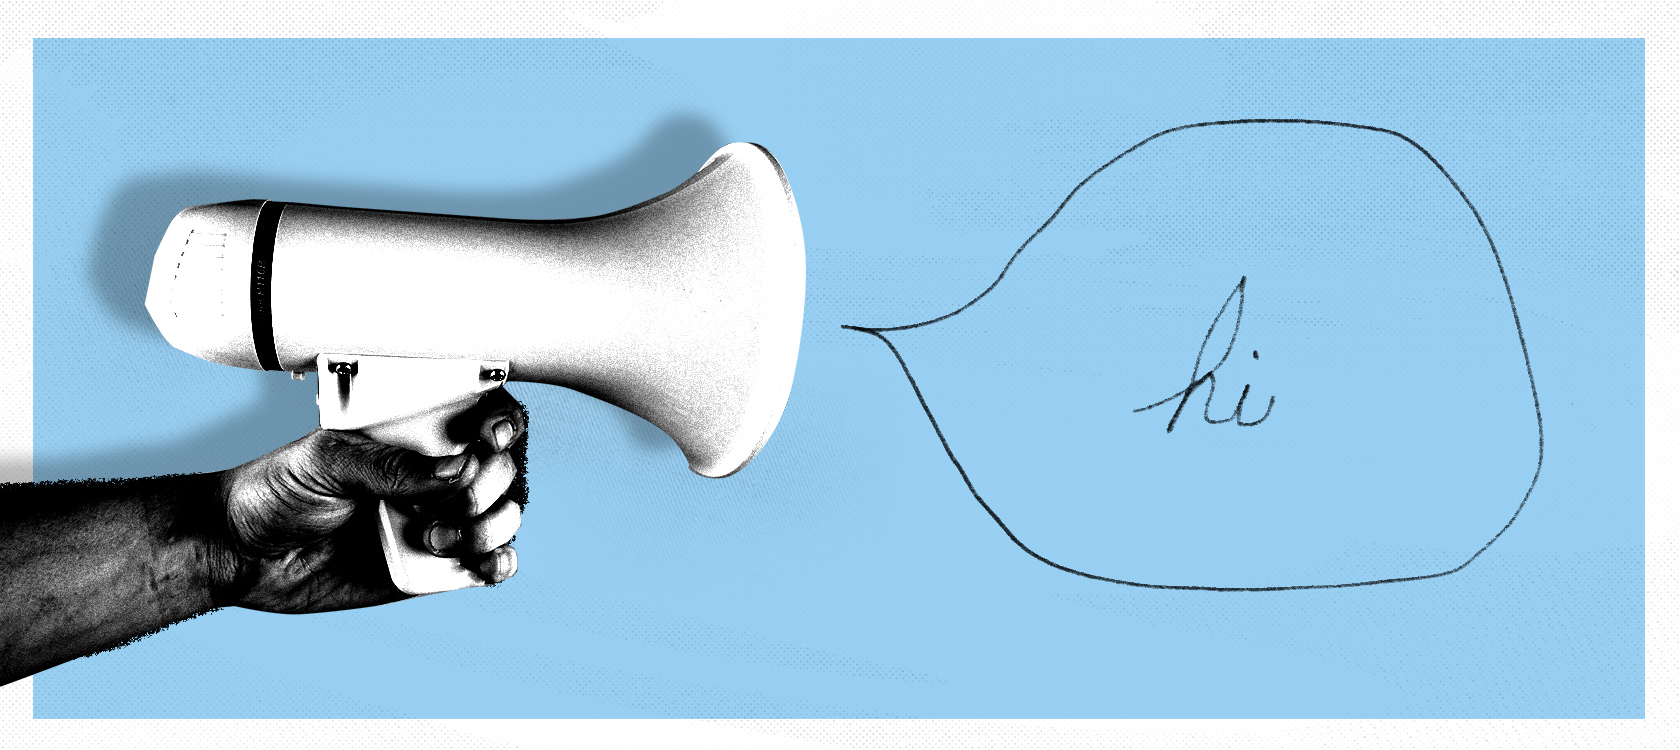 dontfear-megephone